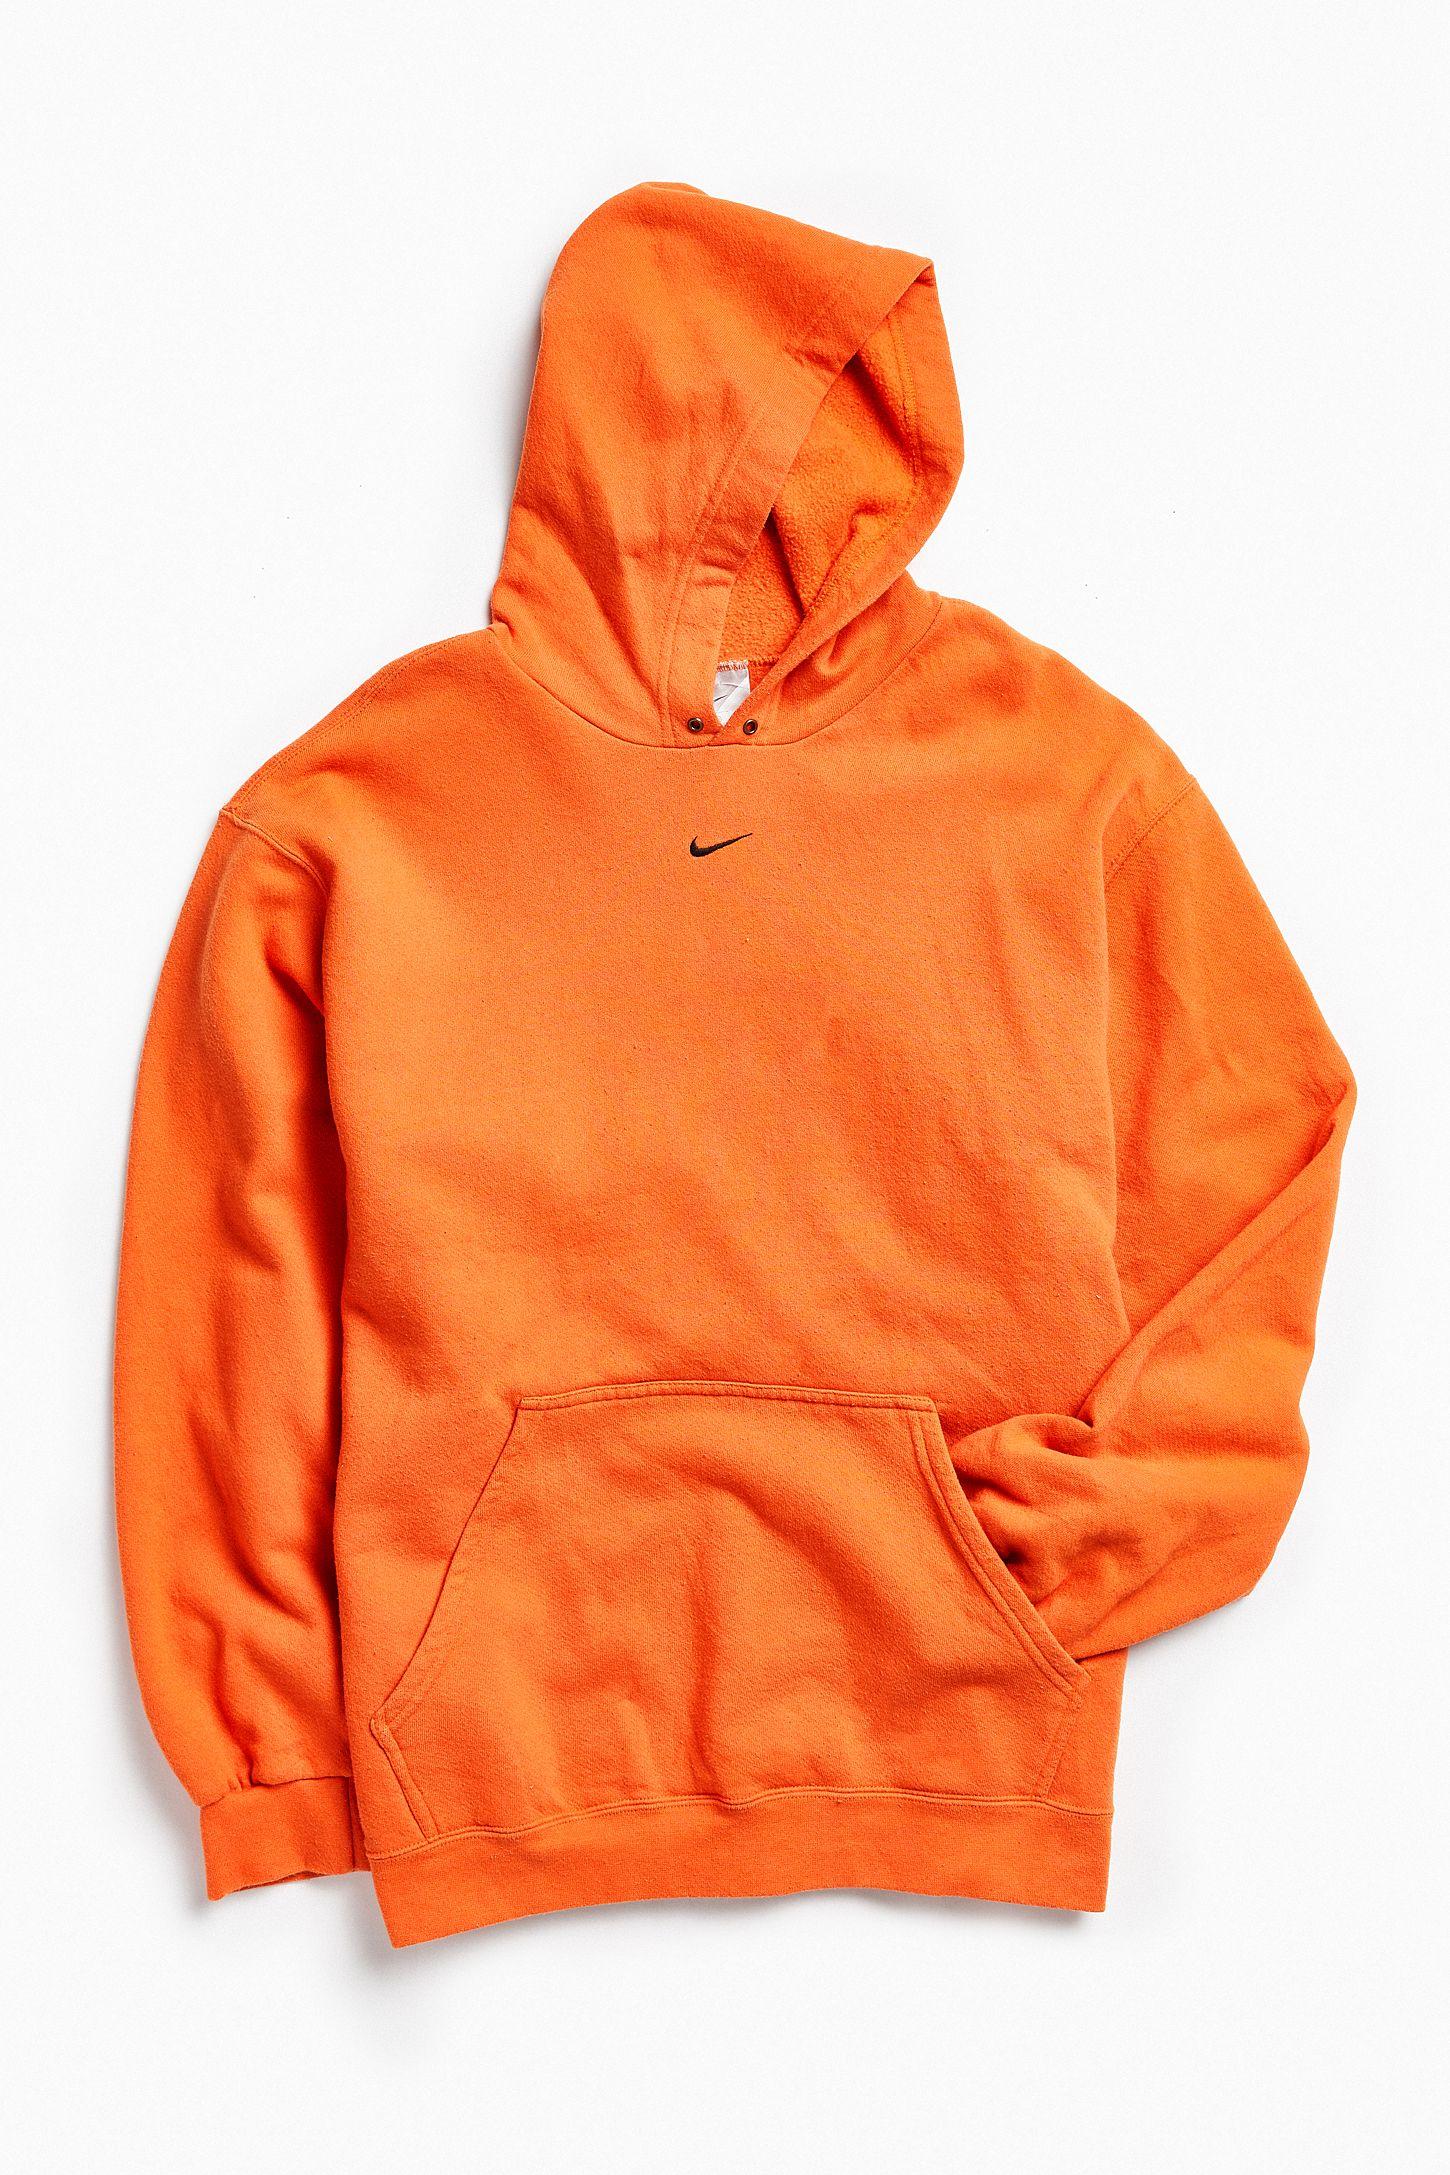 17bdf8b9cdf8 Vintage Nike Orange Logo Hoodie Sweatshirt